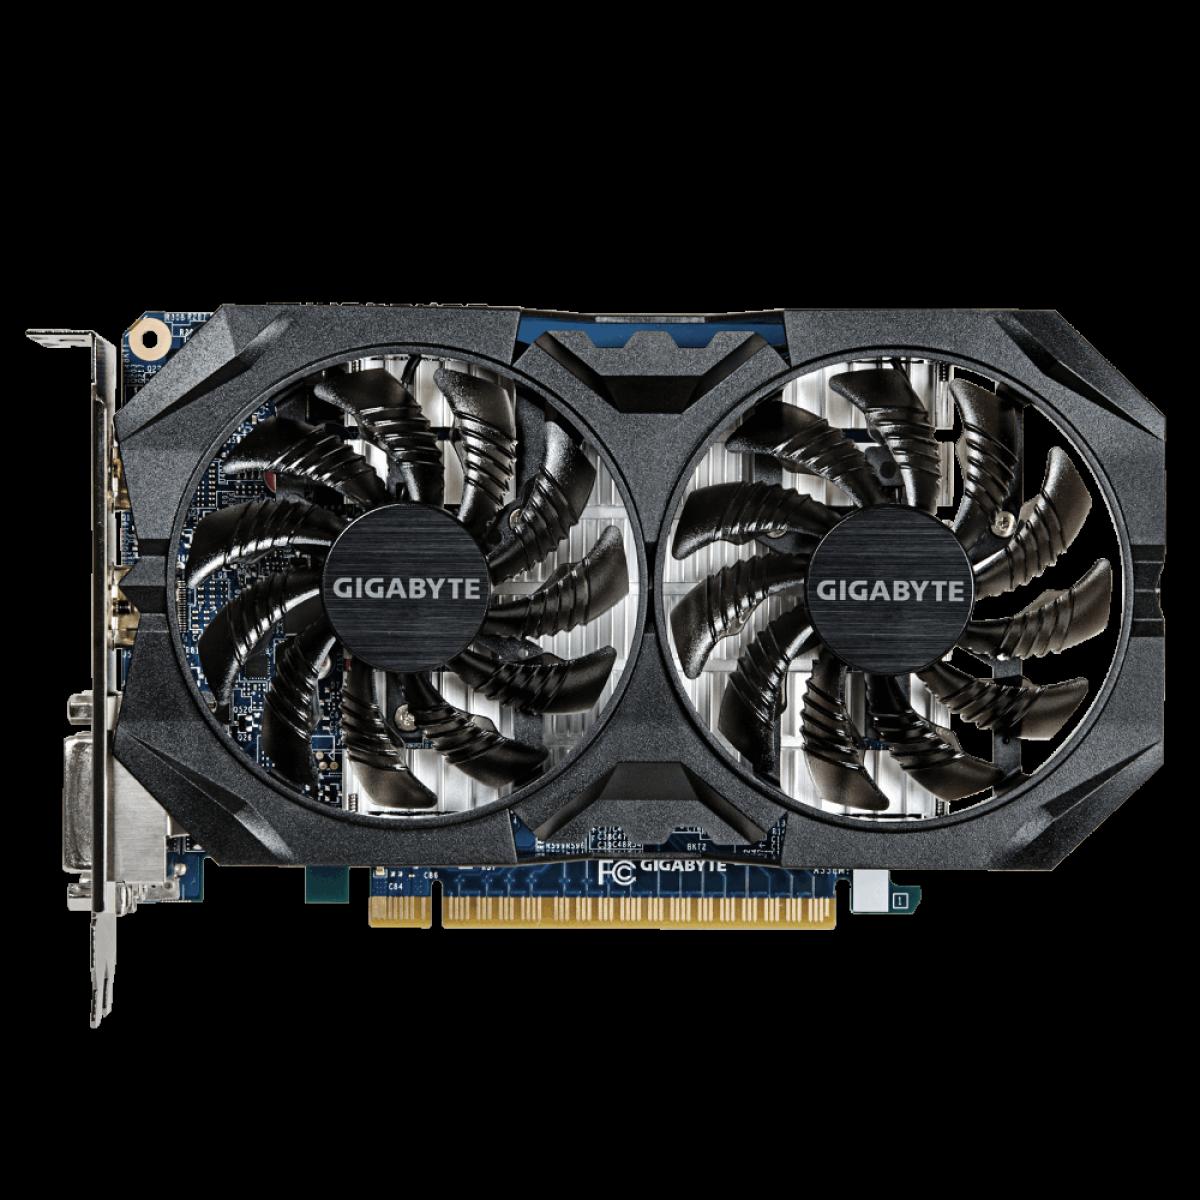 Placa de Vídeo Gigabyte GeForce GTX 750 Ti, 4GB, GDDR5, 128bit, GV-N75TWF2OC-4GI